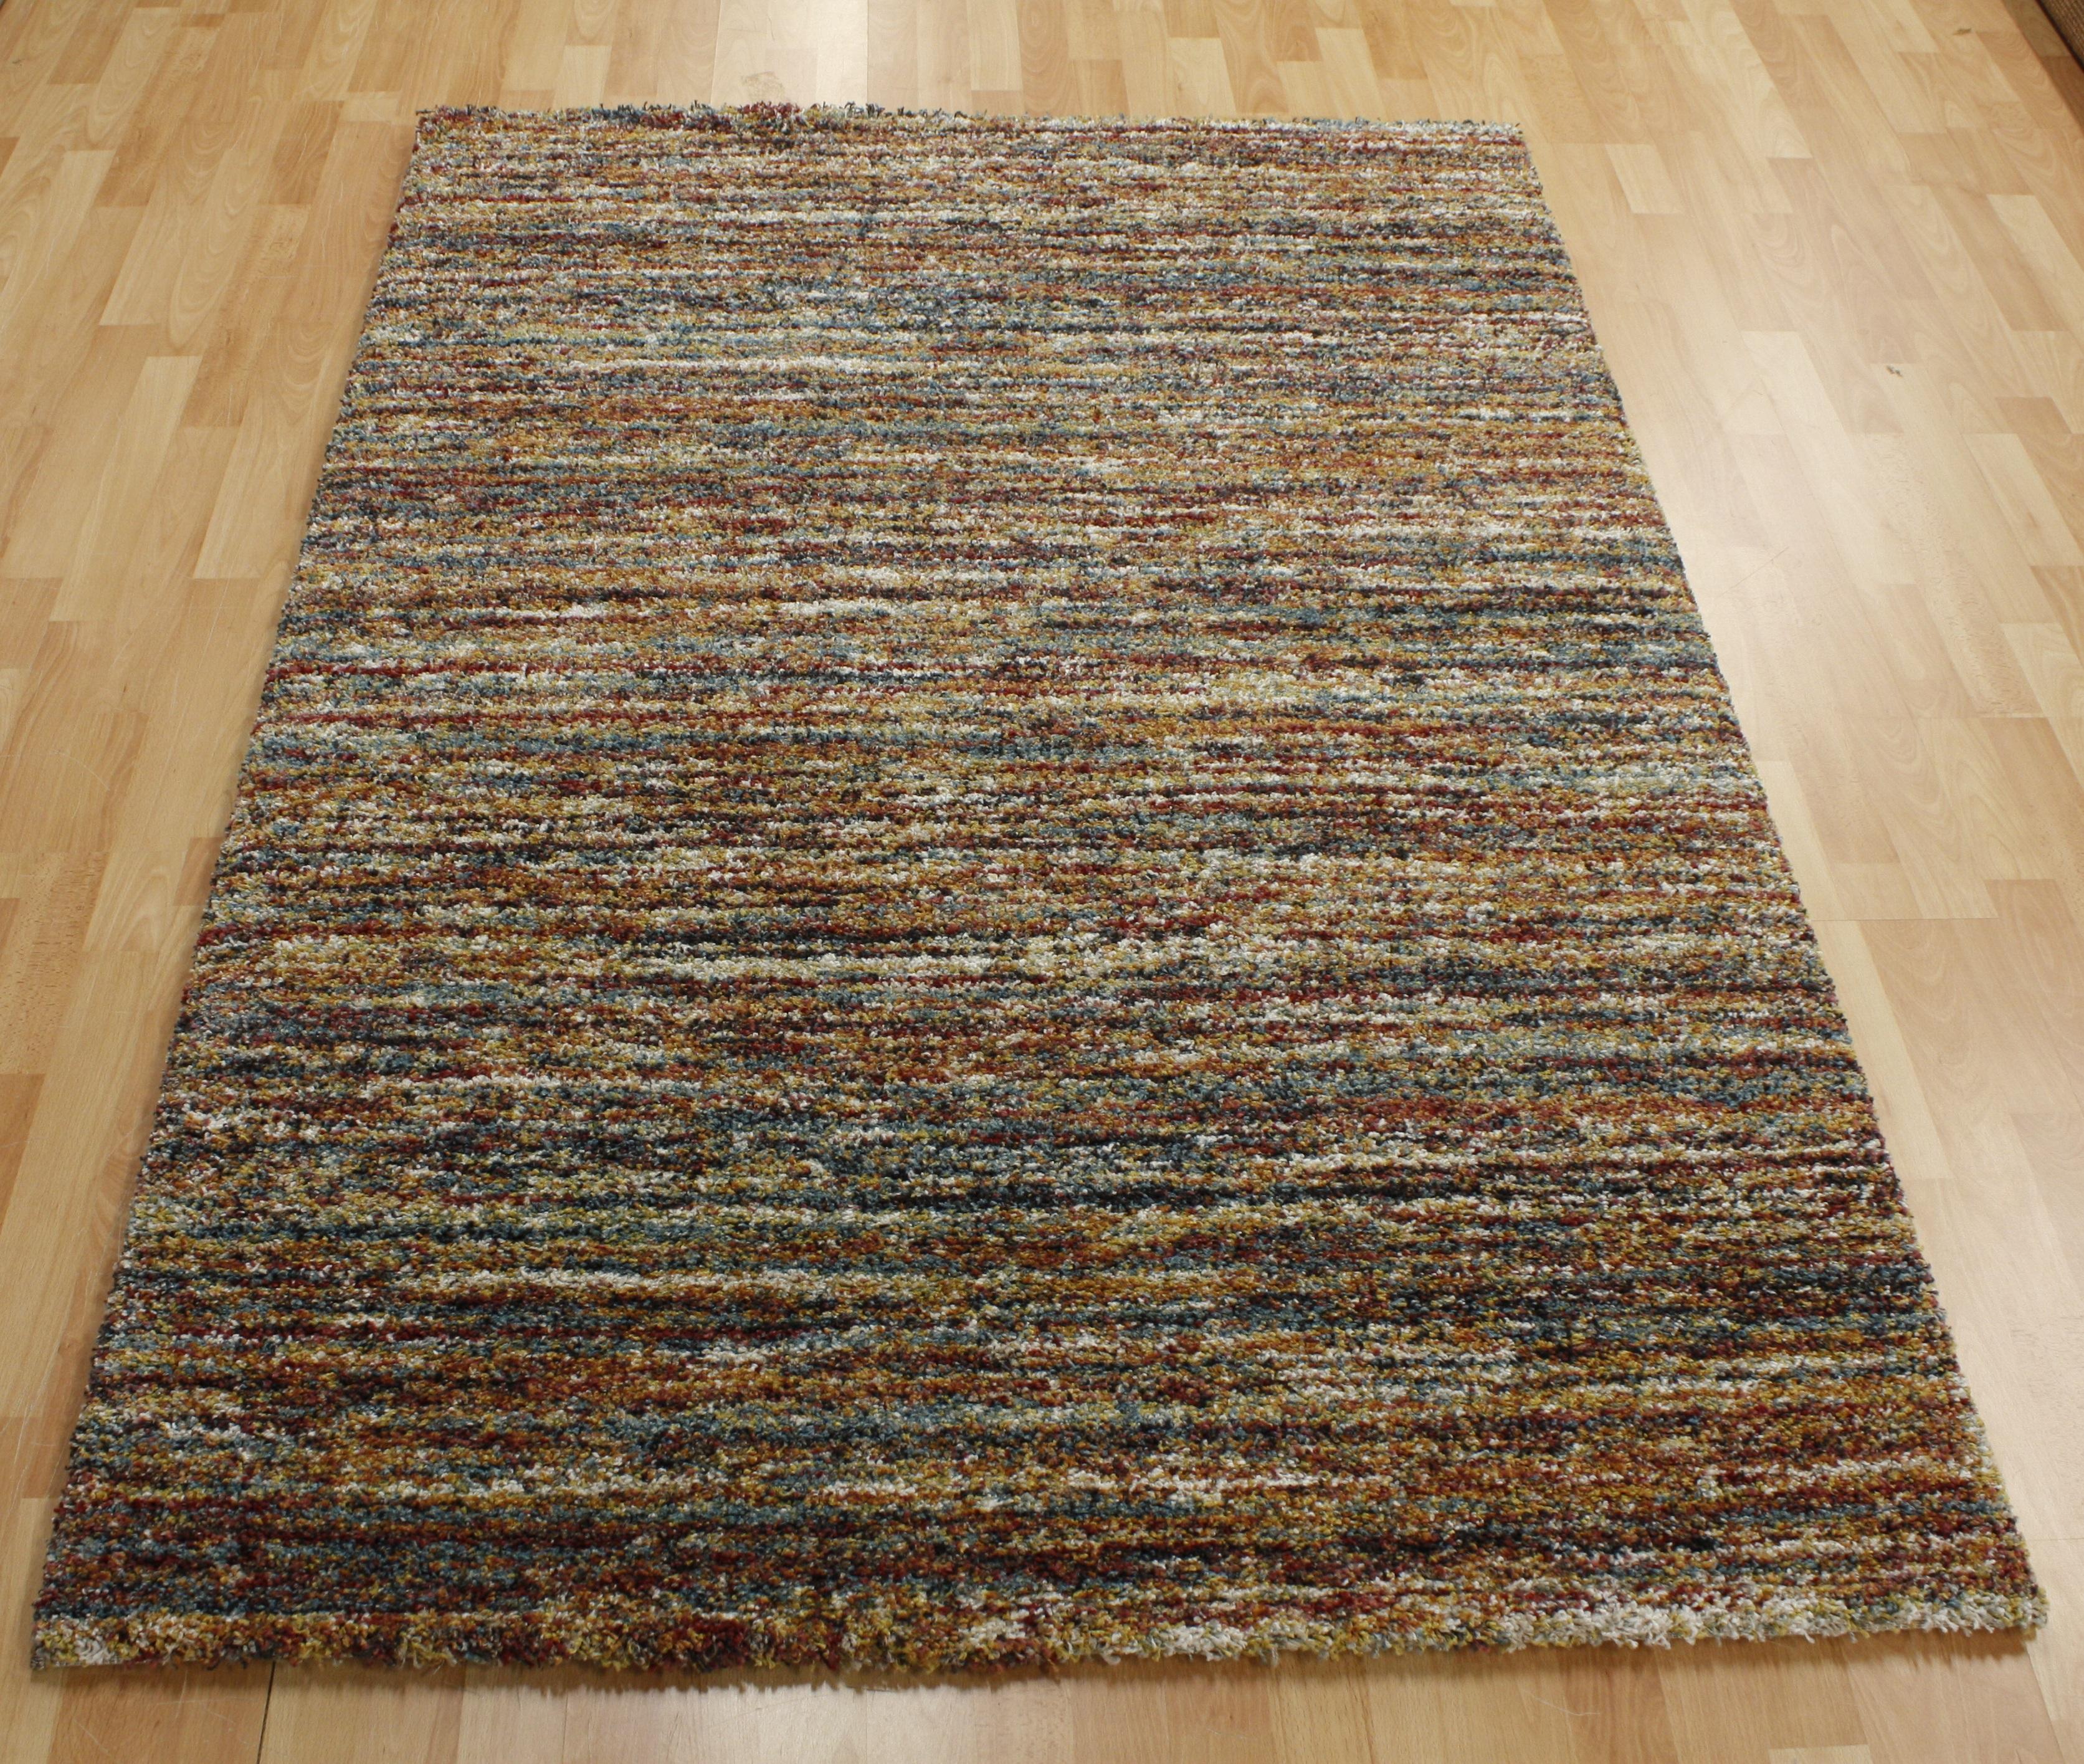 Mehari Rug 230672959 Ragolle 240×300 cm Stripes rost  eBay